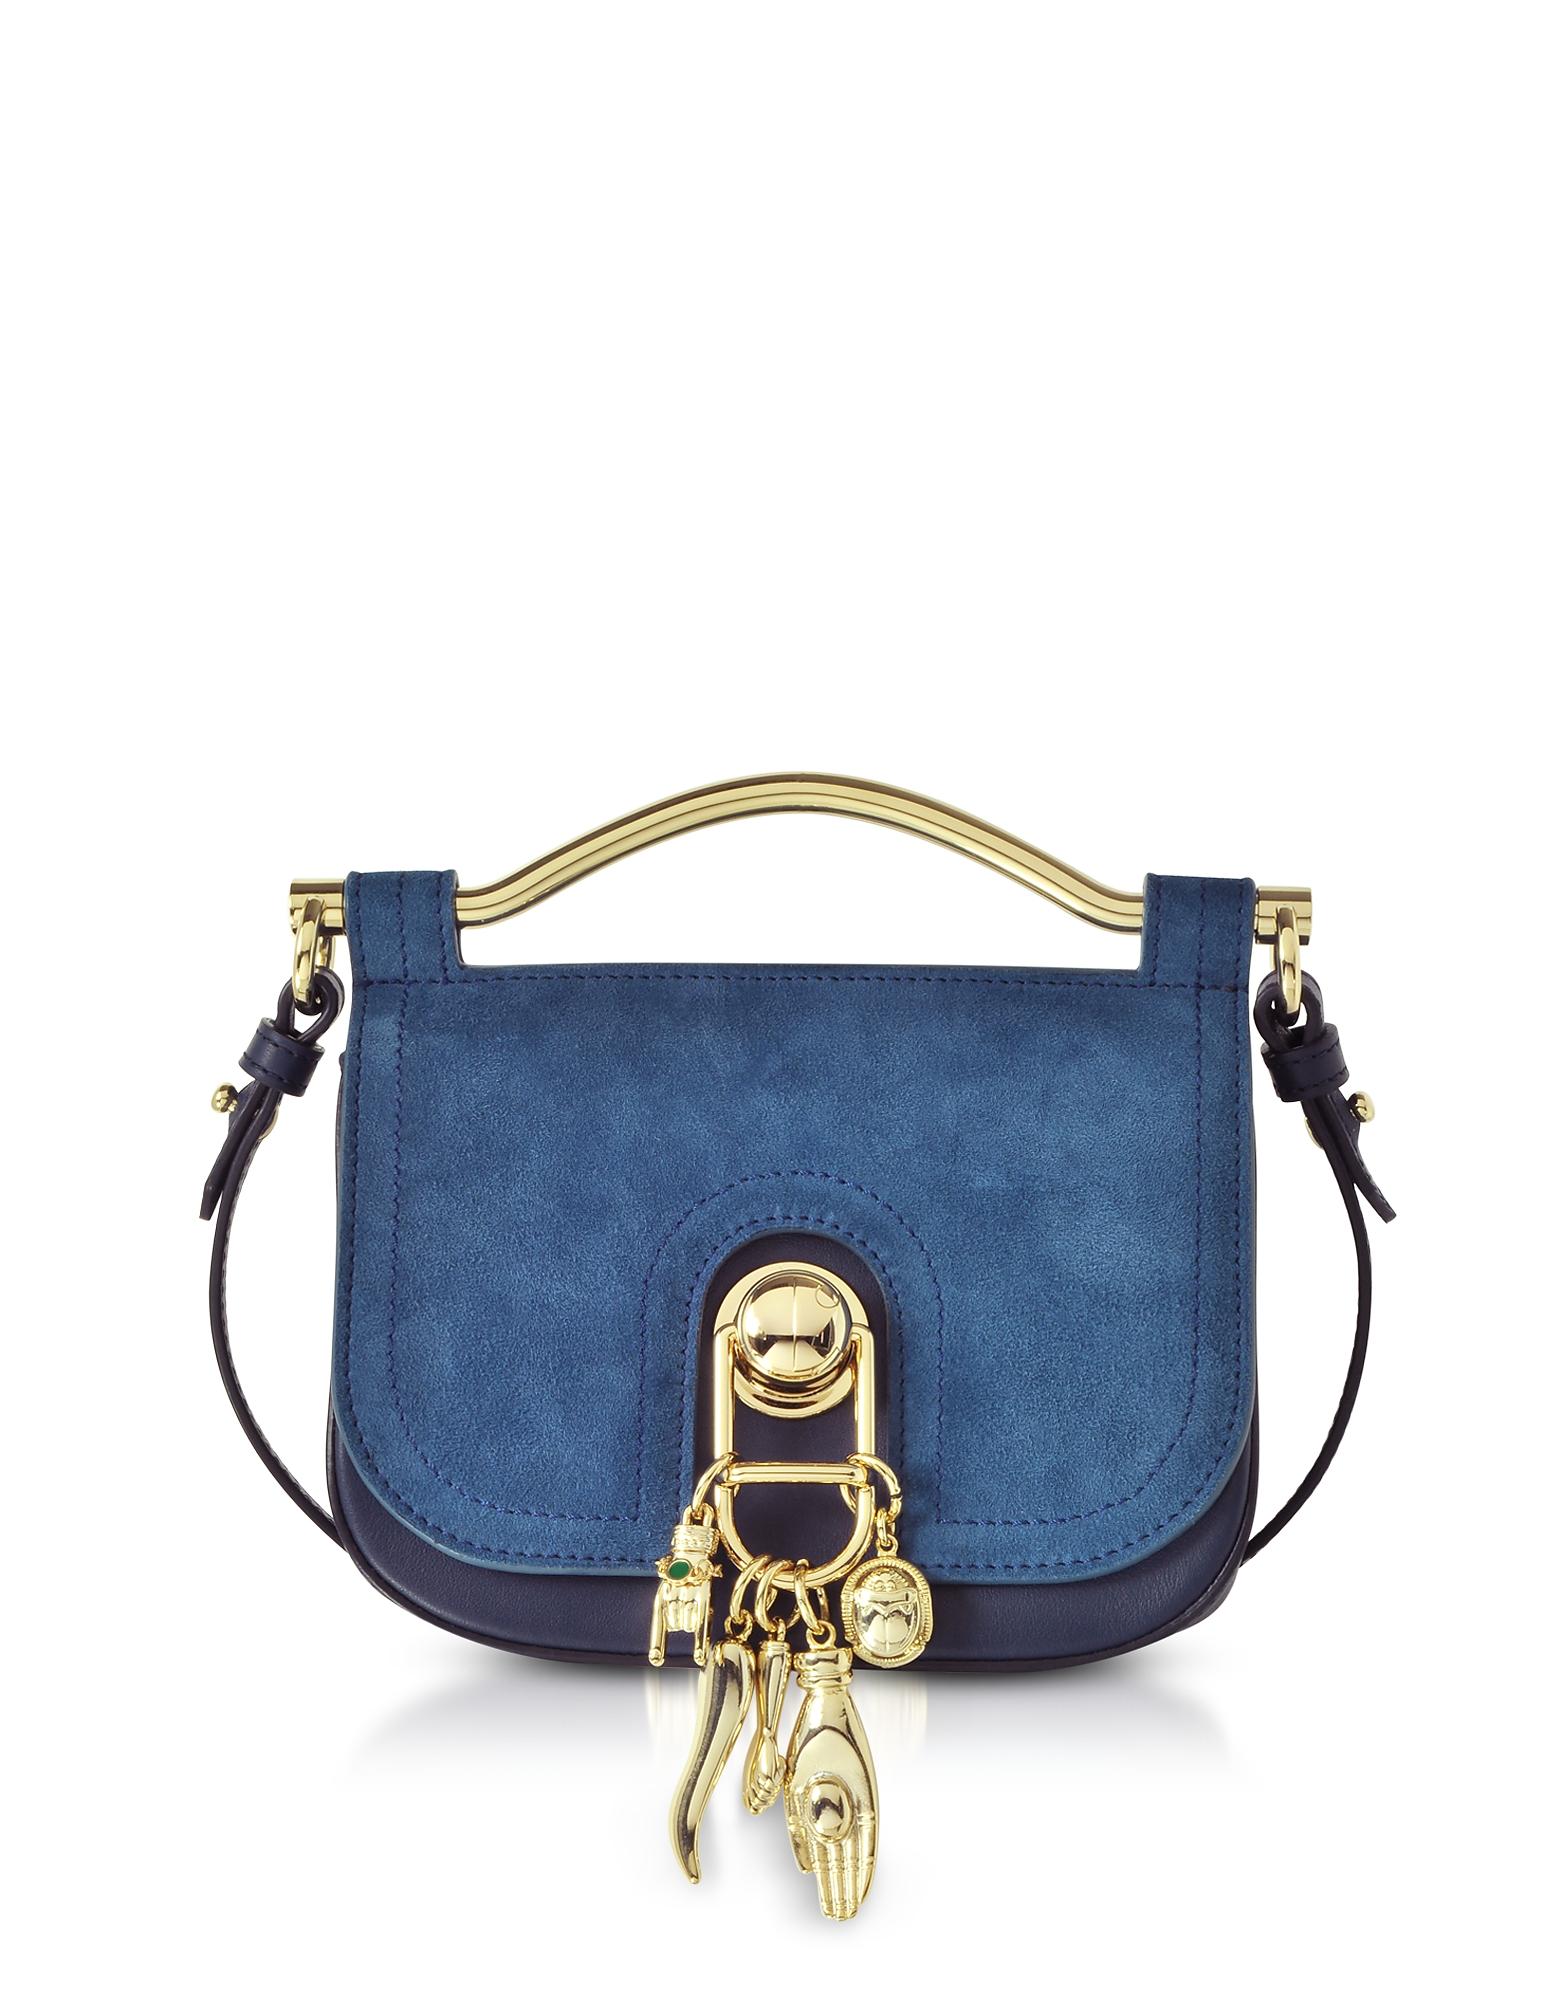 Image of Carven Designer Handbags, Suede and Leather Misti Crossbody Bag